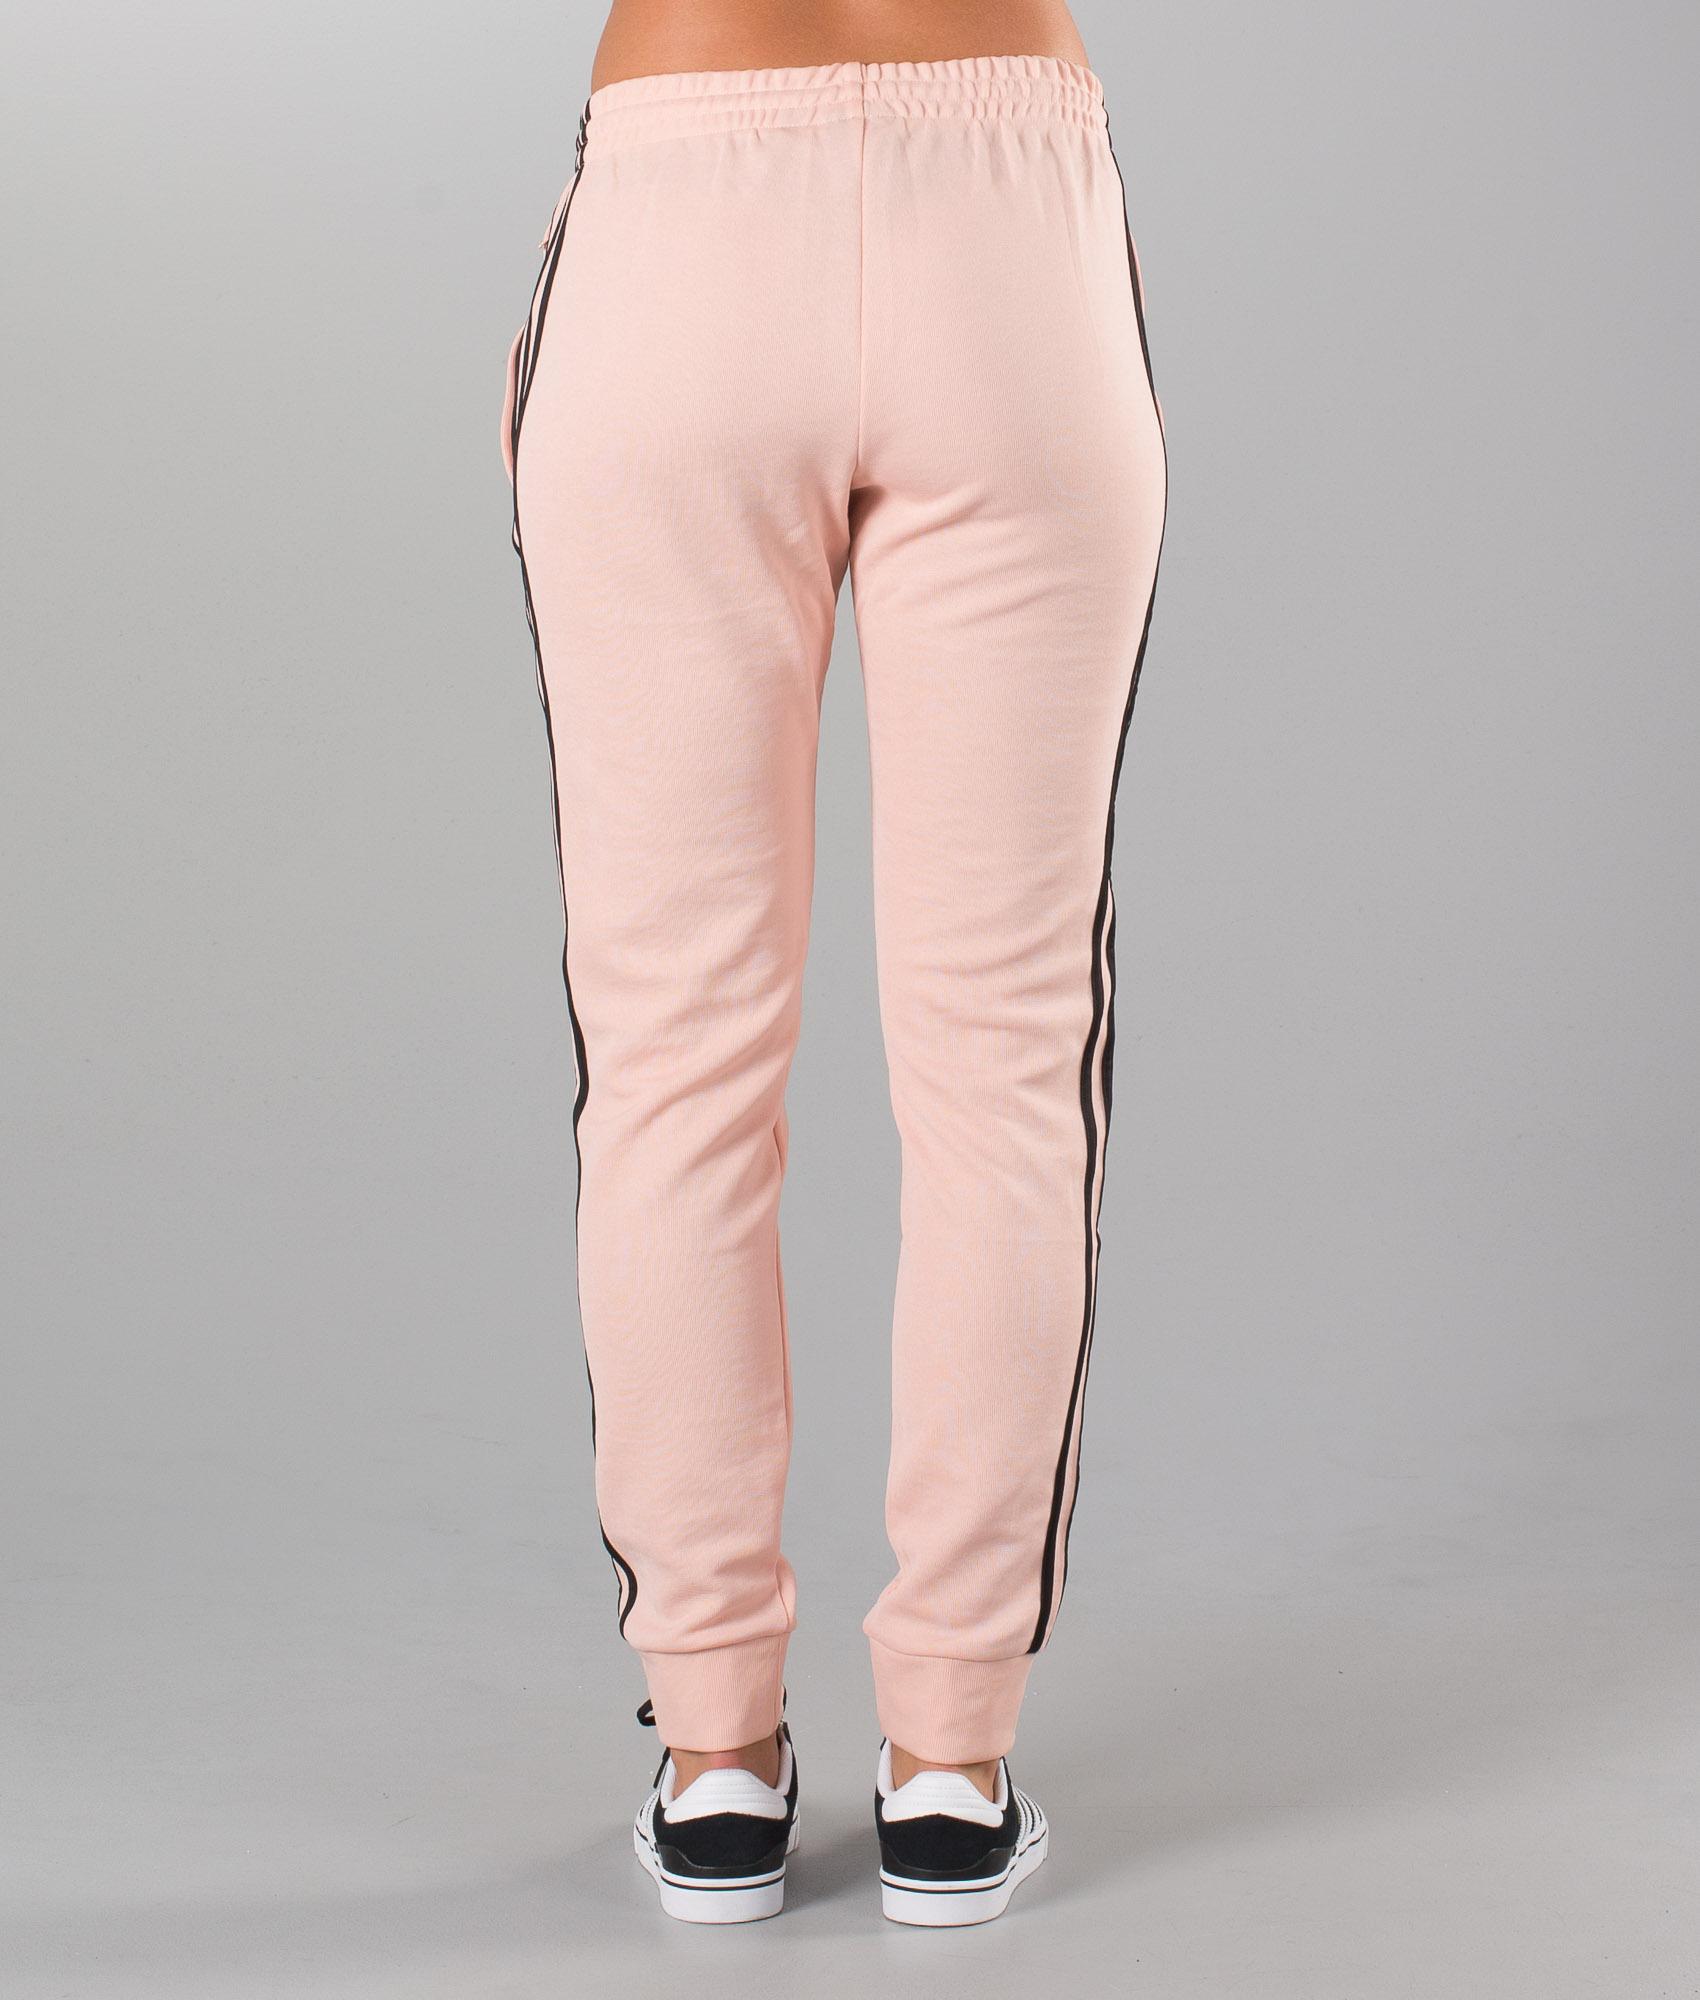 Tp Sst Unisex Adidas Chez Vappnk Originals Pantalon De Cuffed Atwn4fq